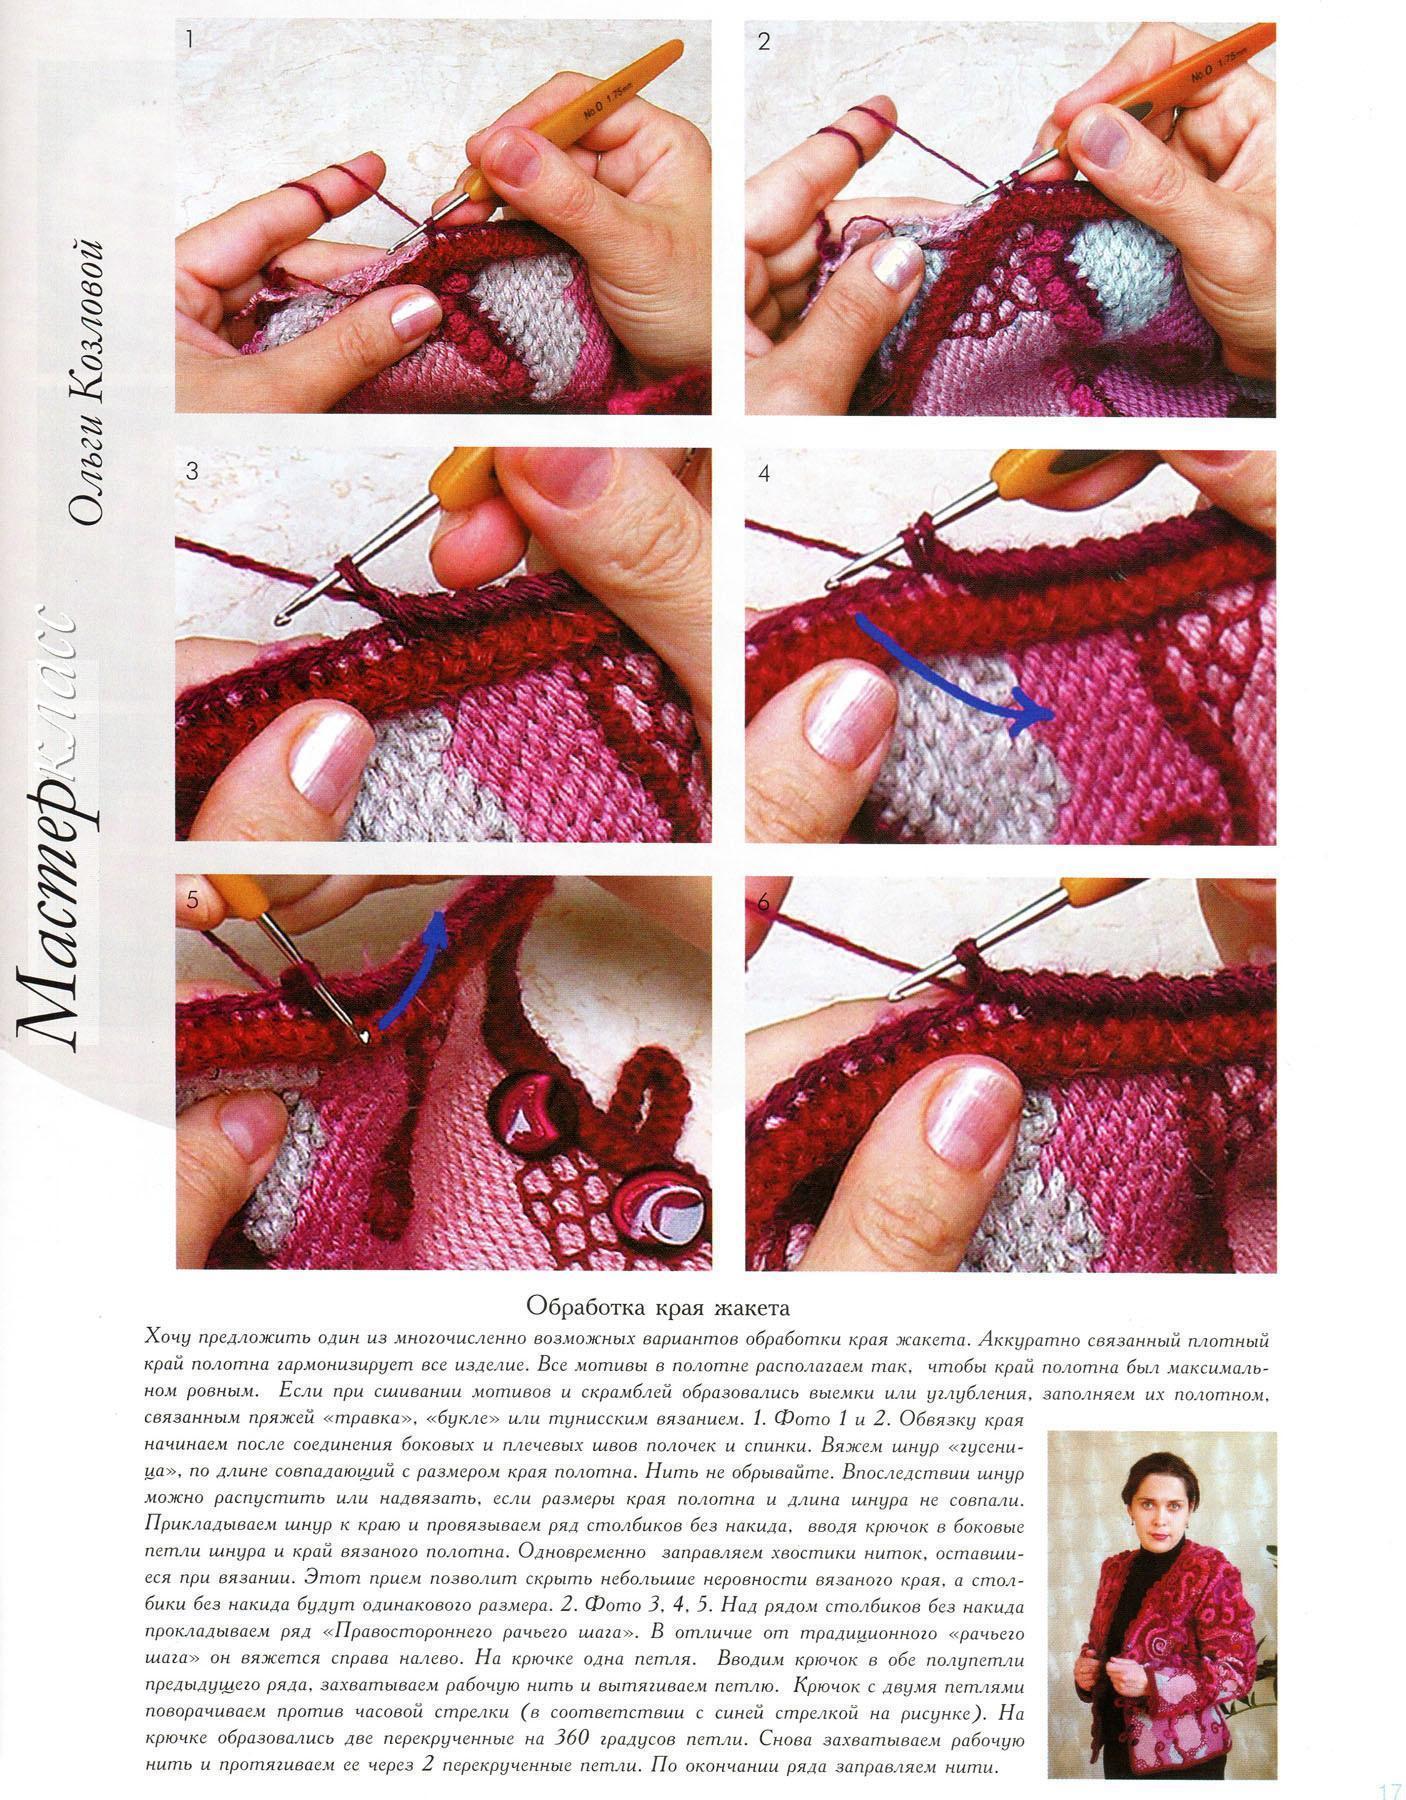 Обработка краев в вязании